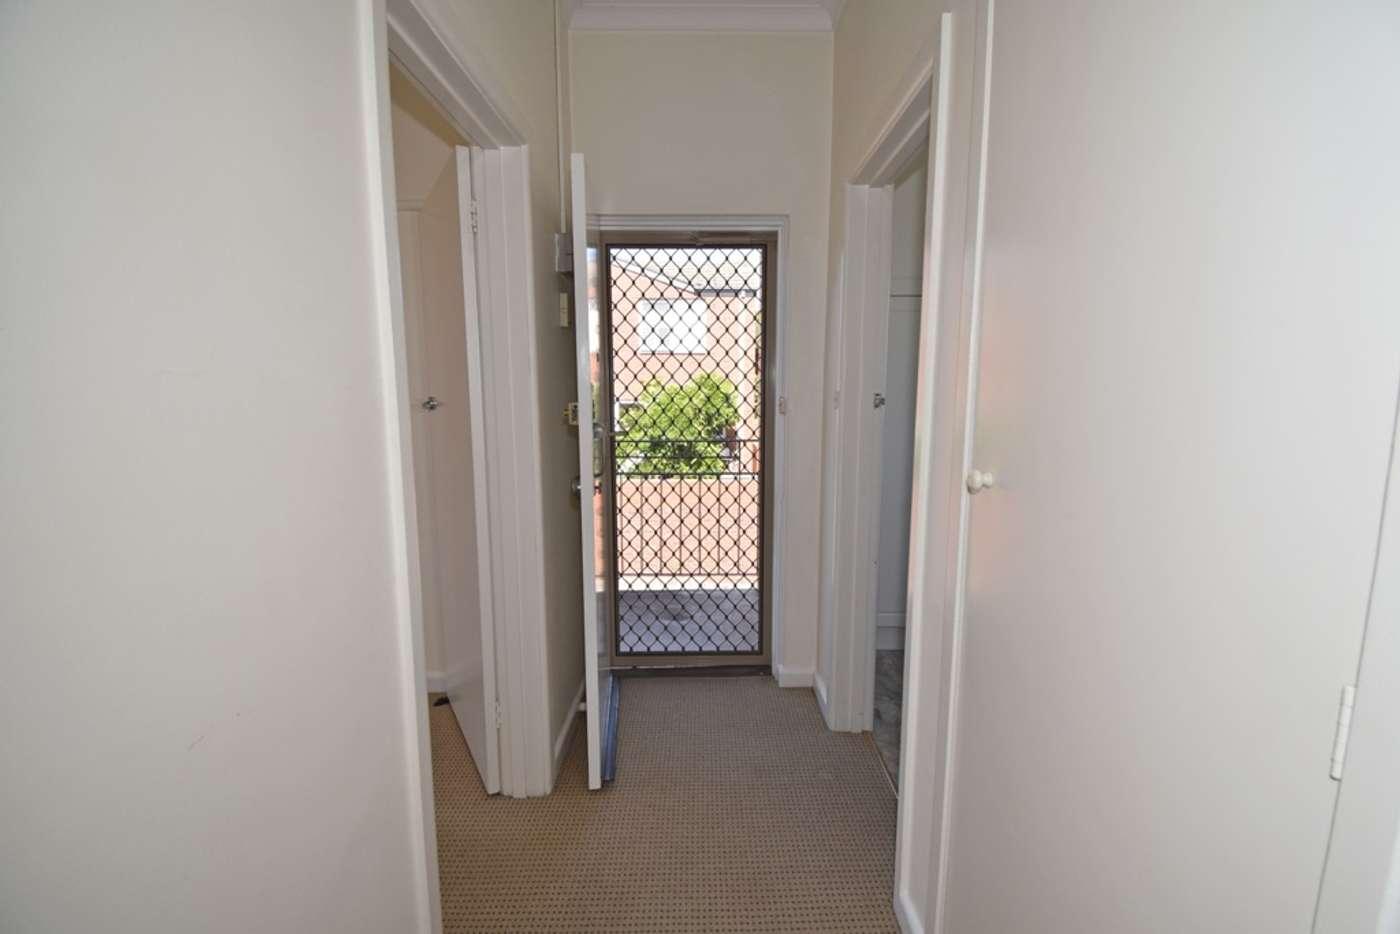 Seventh view of Homely apartment listing, 10/4 Osborne Avenue, Glen Iris VIC 3146